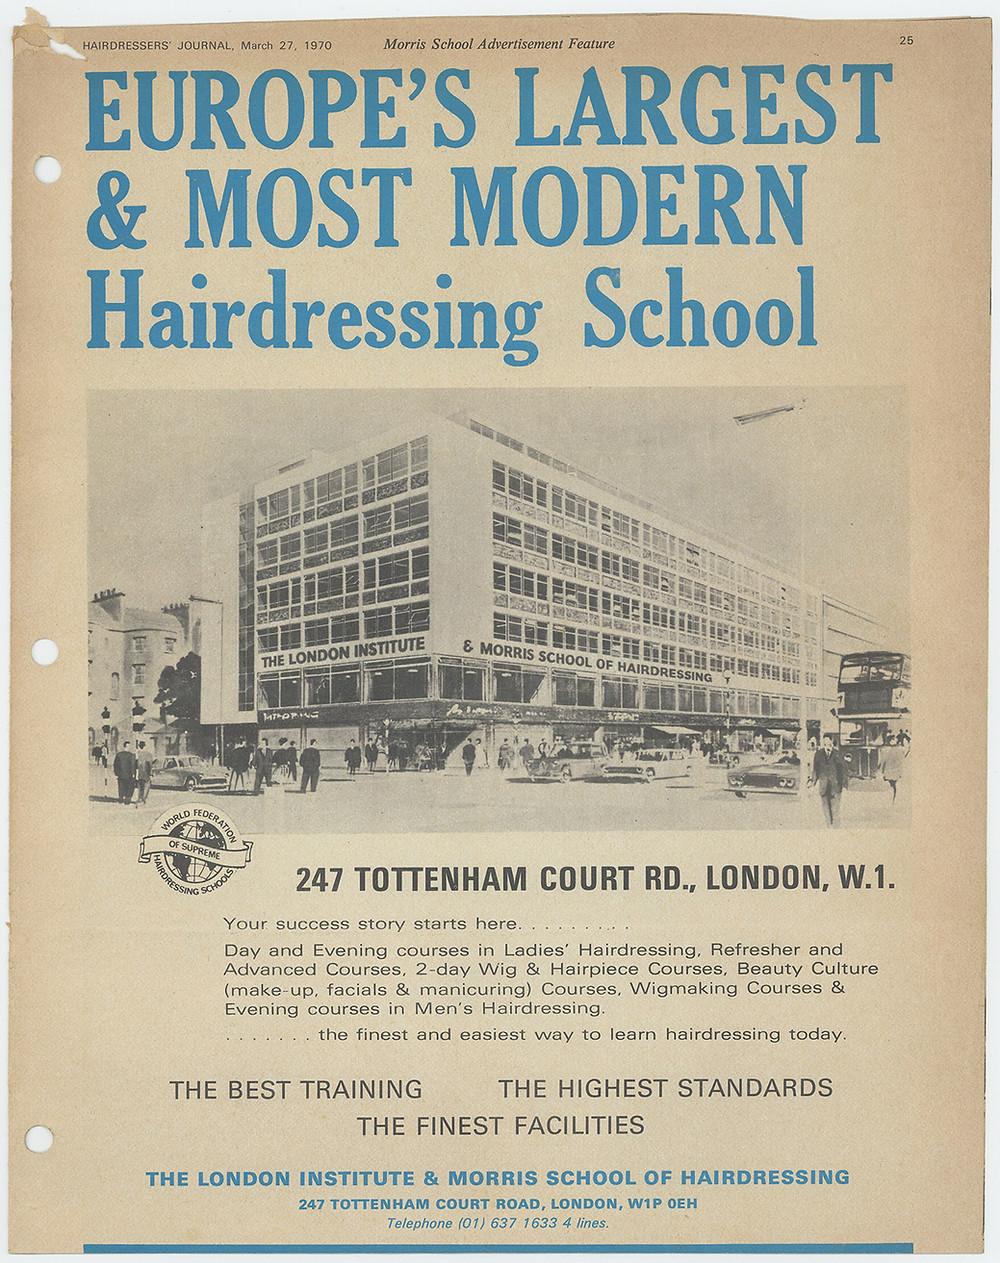 Morris School advertisement feature, 1970.